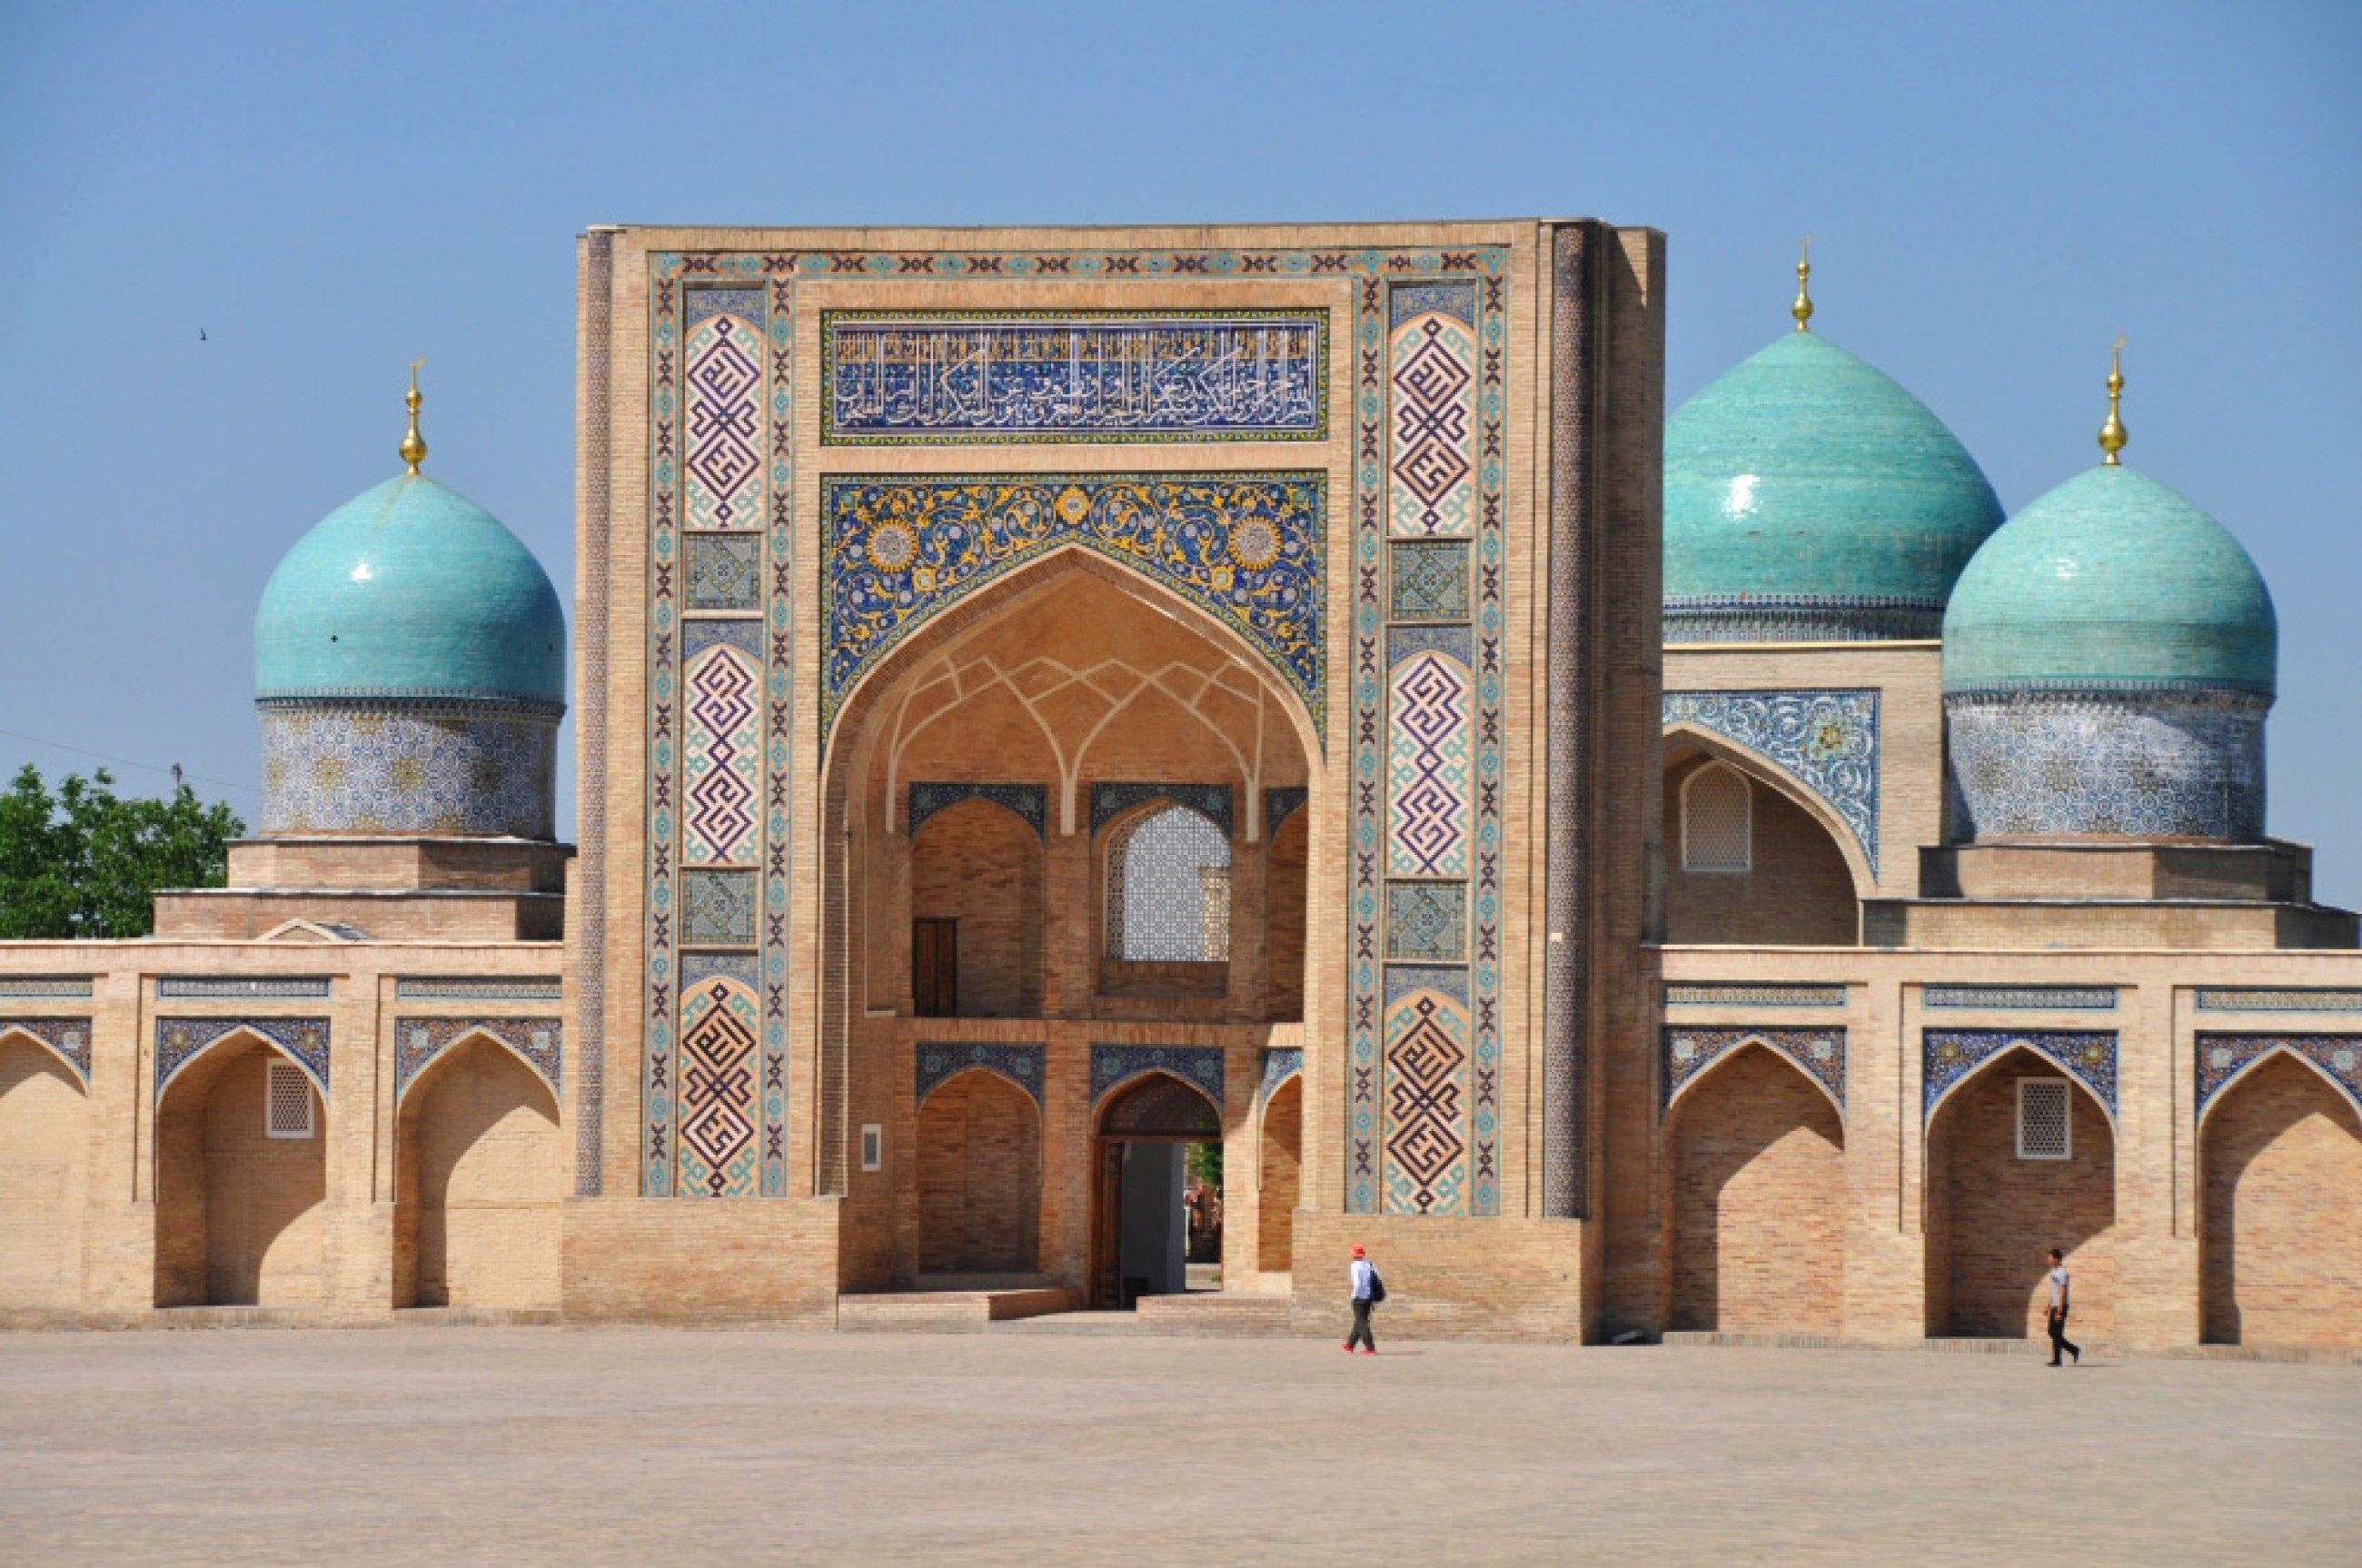 https://bubo.sk/uploads/galleries/3470/uzbekistan-10.jpg